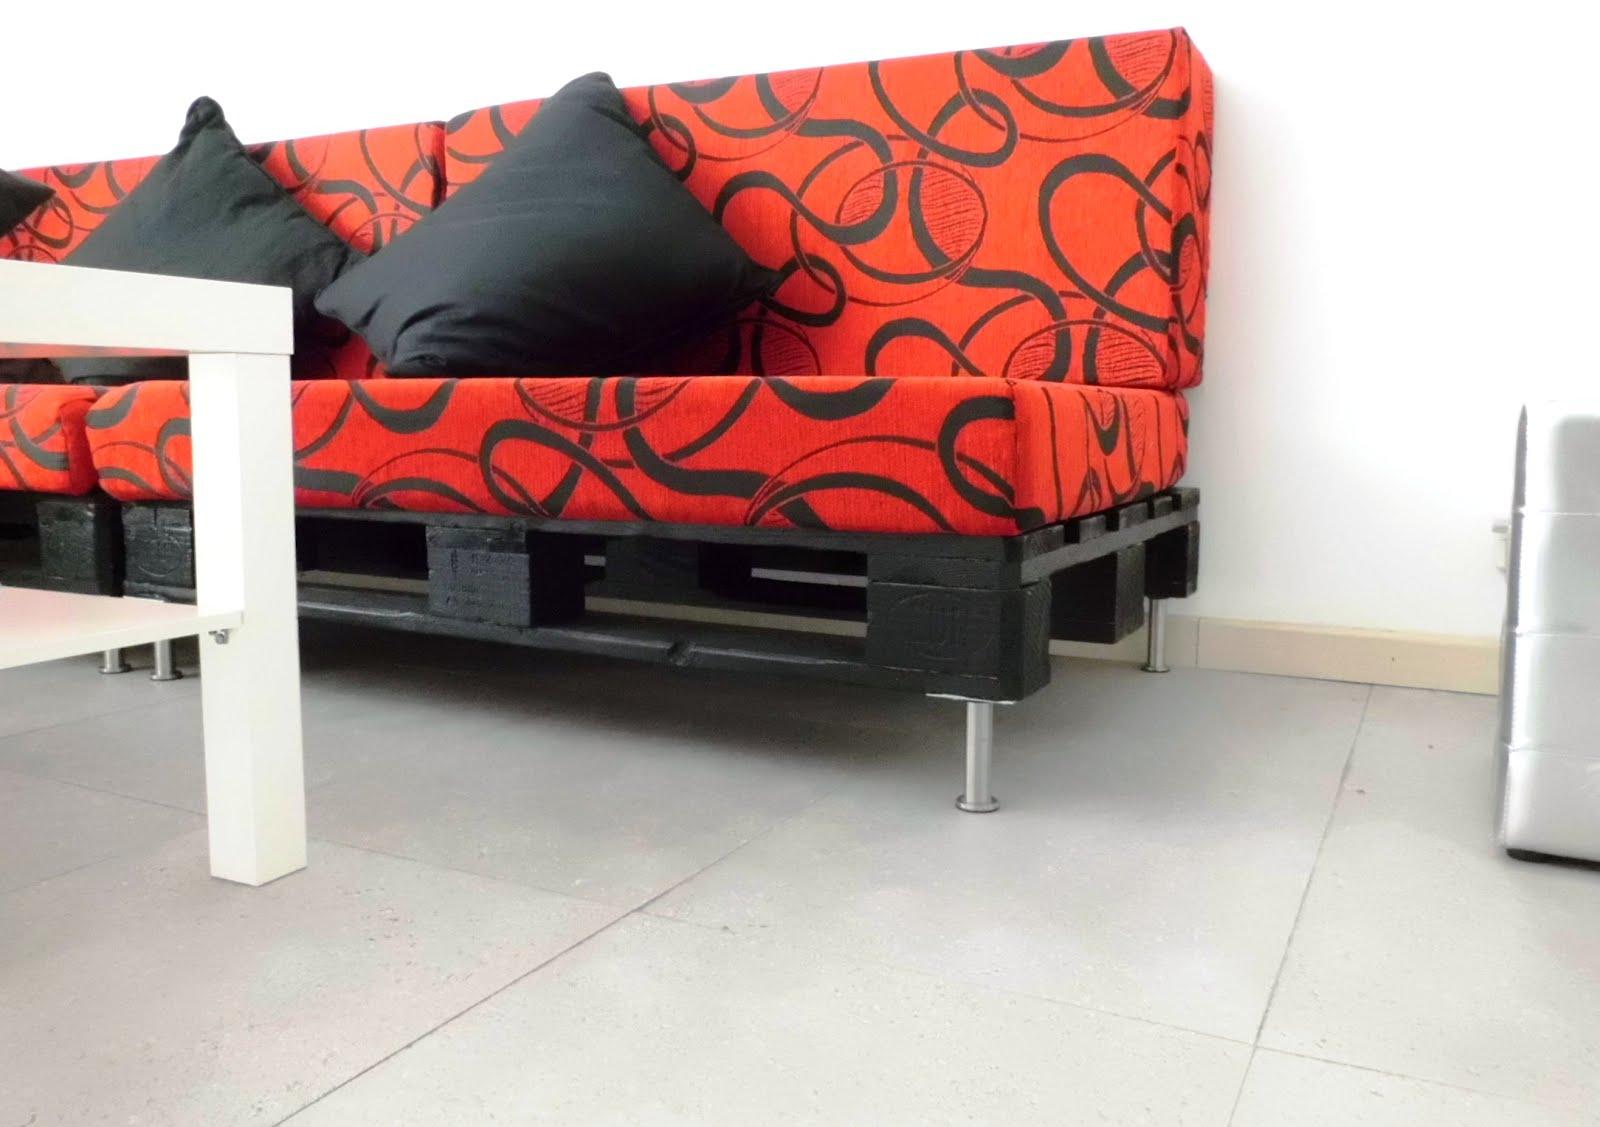 Como Hacer Un Sofa Con Palets De Madera Si Quieres Aprender Cmo Se - Como-hacer-un-sofa-con-palets-de-madera